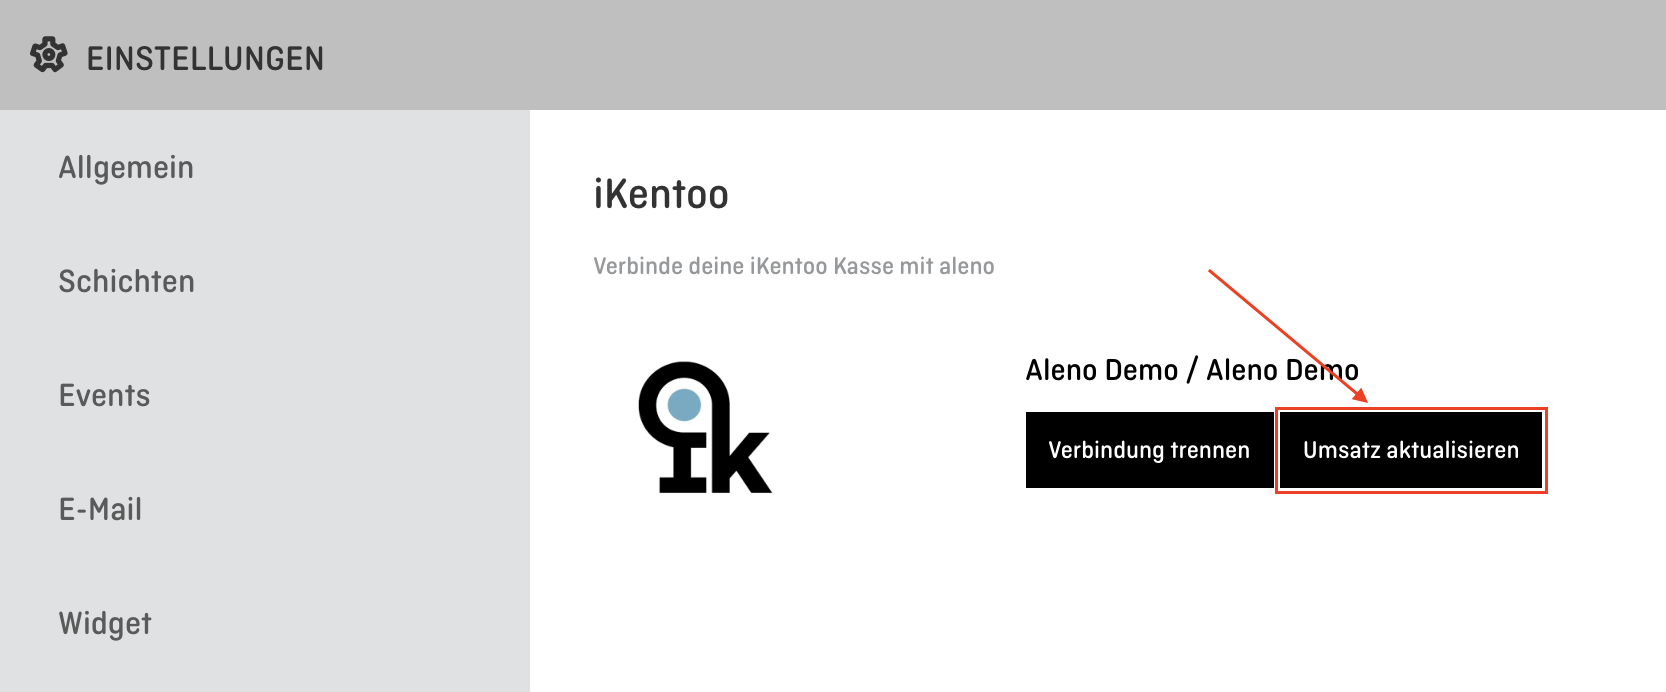 iKentoo-POS-aleno-Umsatz-aktualisieren.png